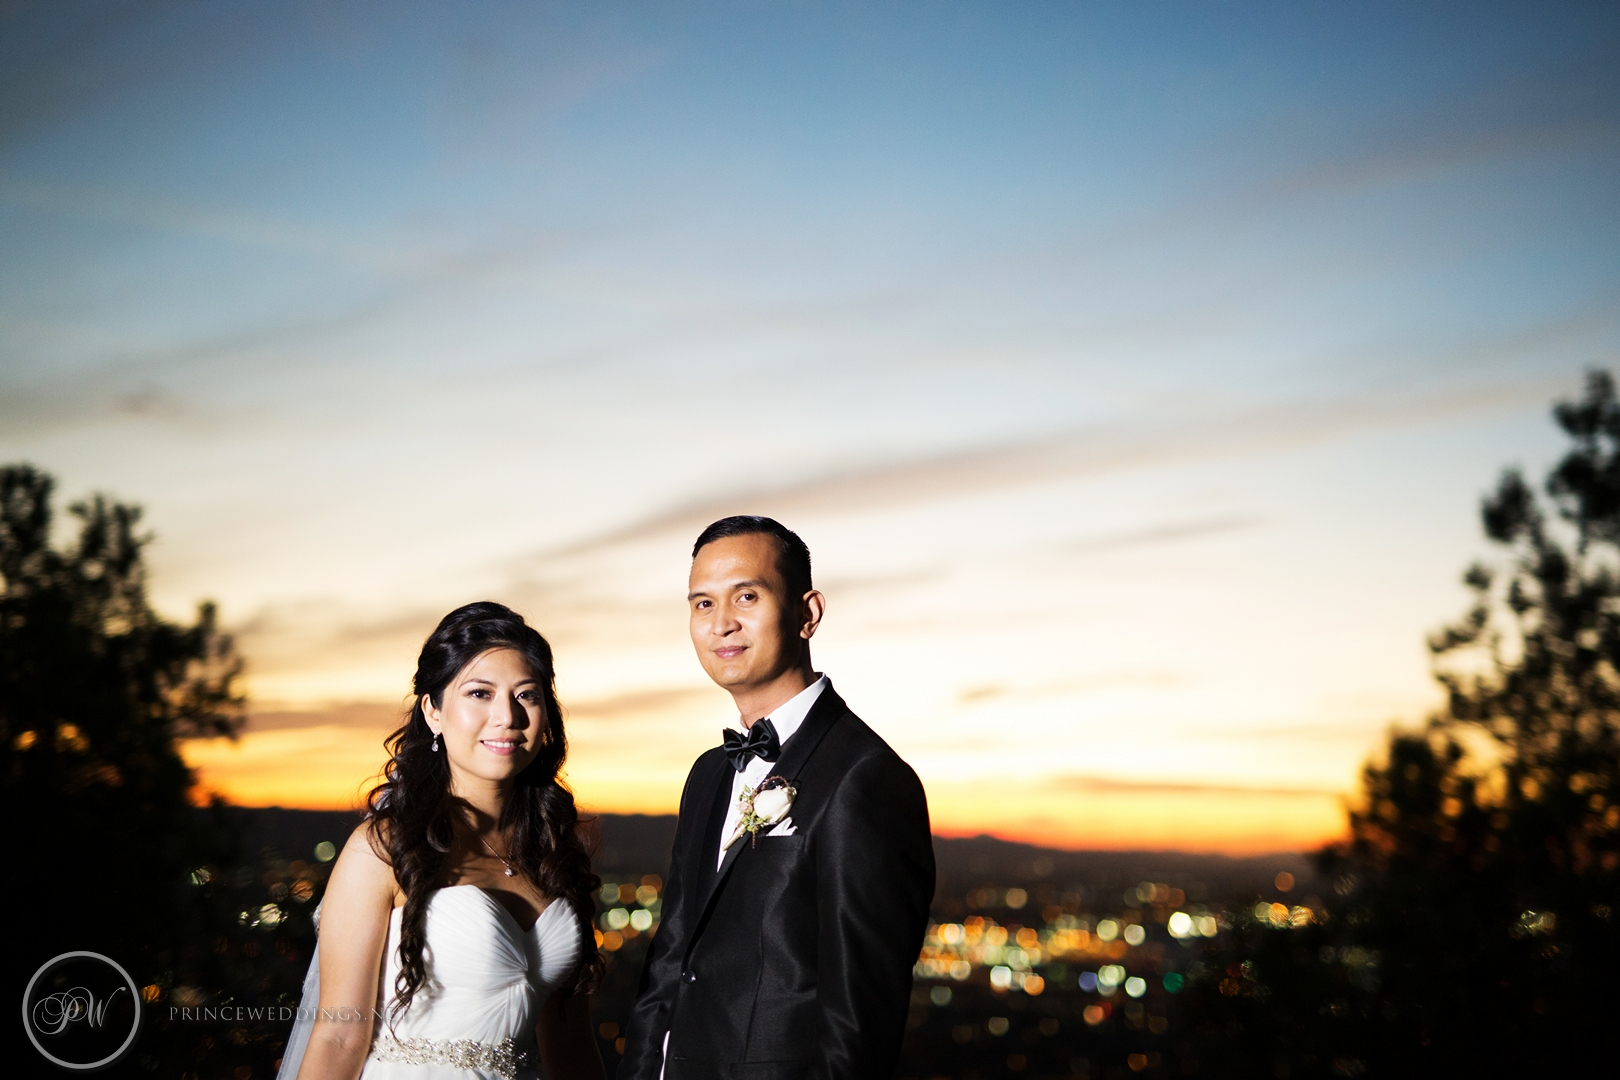 Castaway_Burbank_Wedding_Photo_Christian_Autumn064.jpg